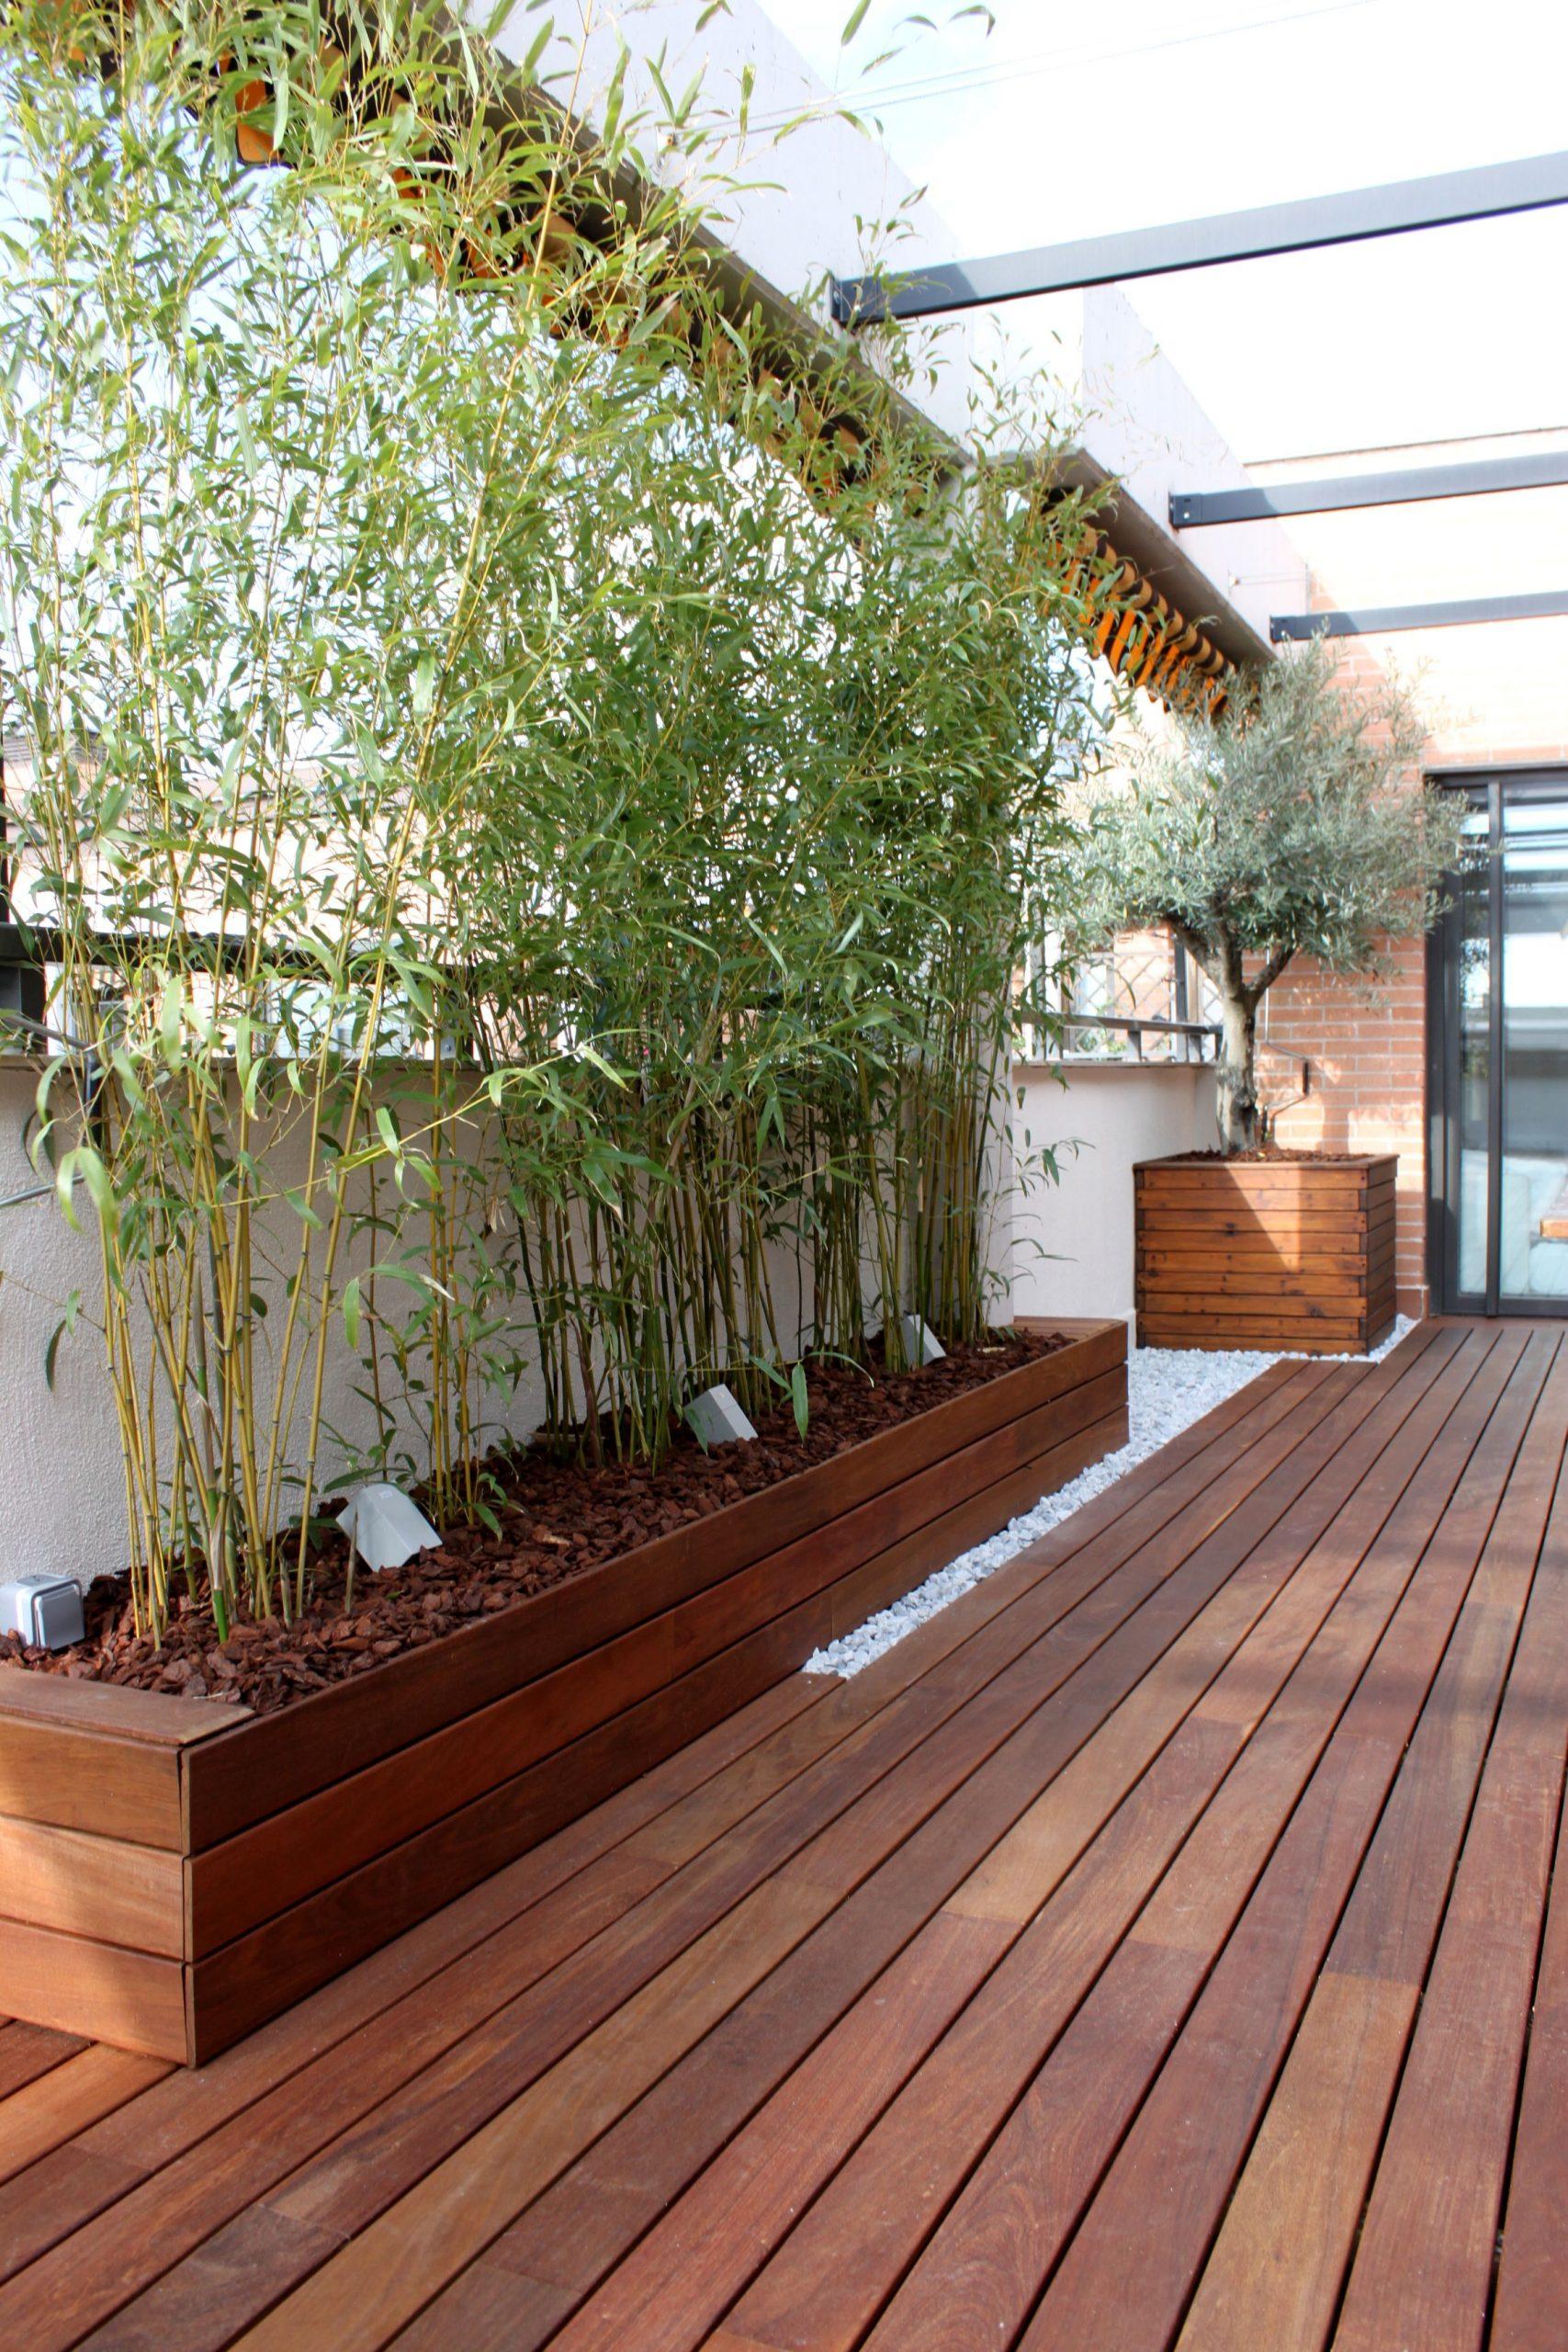 Jardinera De Madera De Ipe Integrada Con El Pavimento ... intérieur Pont En Bois Pour Jardin